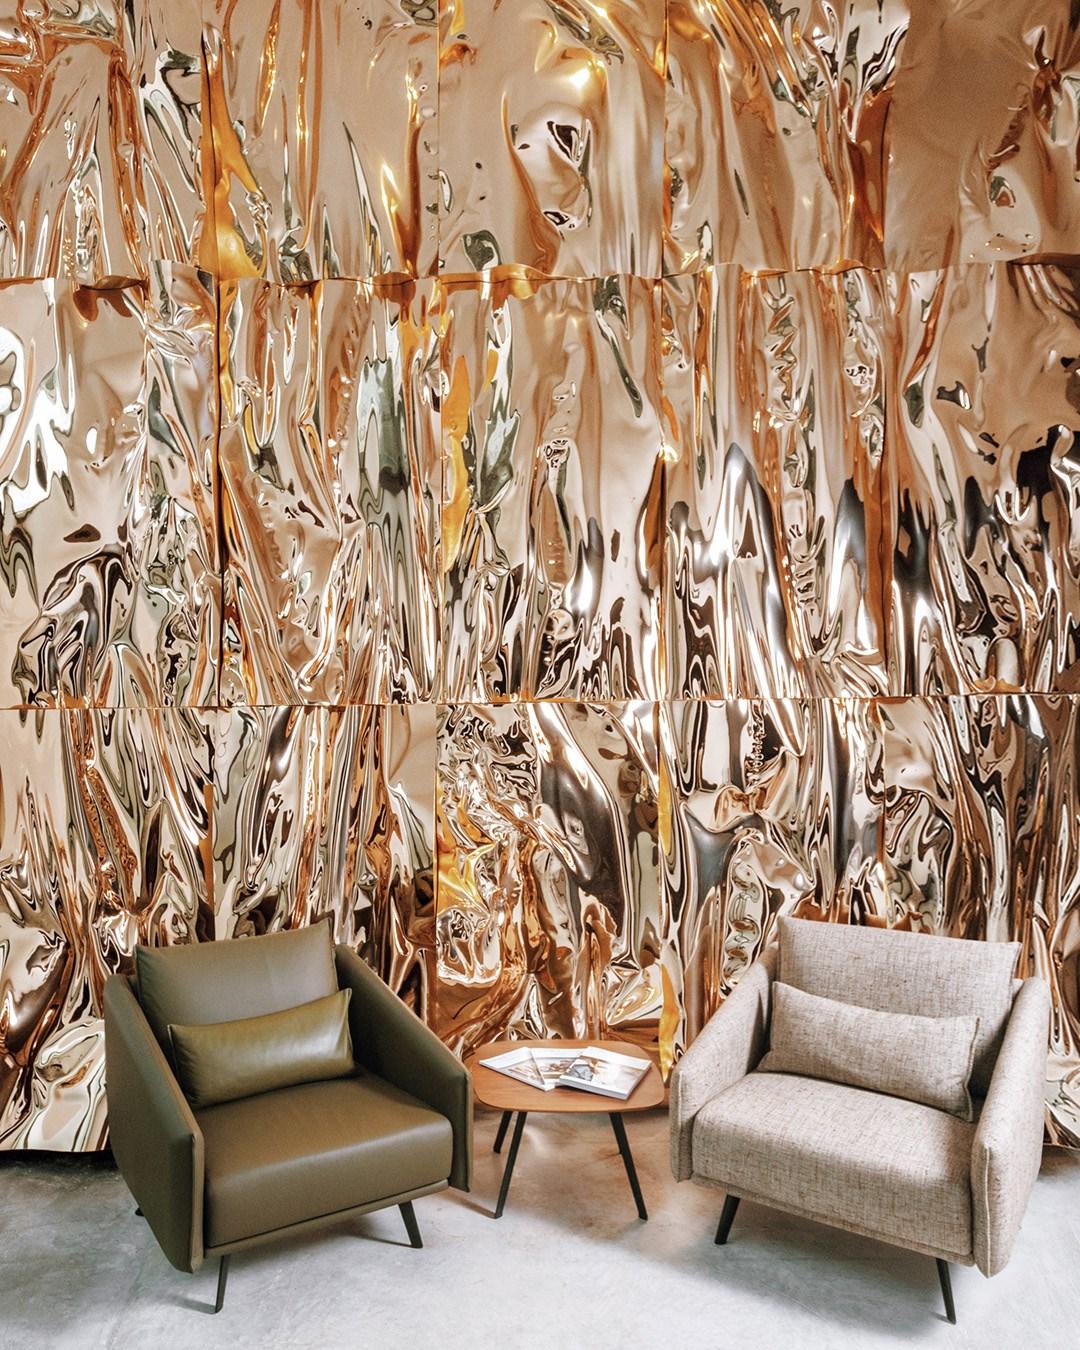 SStua-Jon-Gasca-Costura-Armchair-Matisse-7